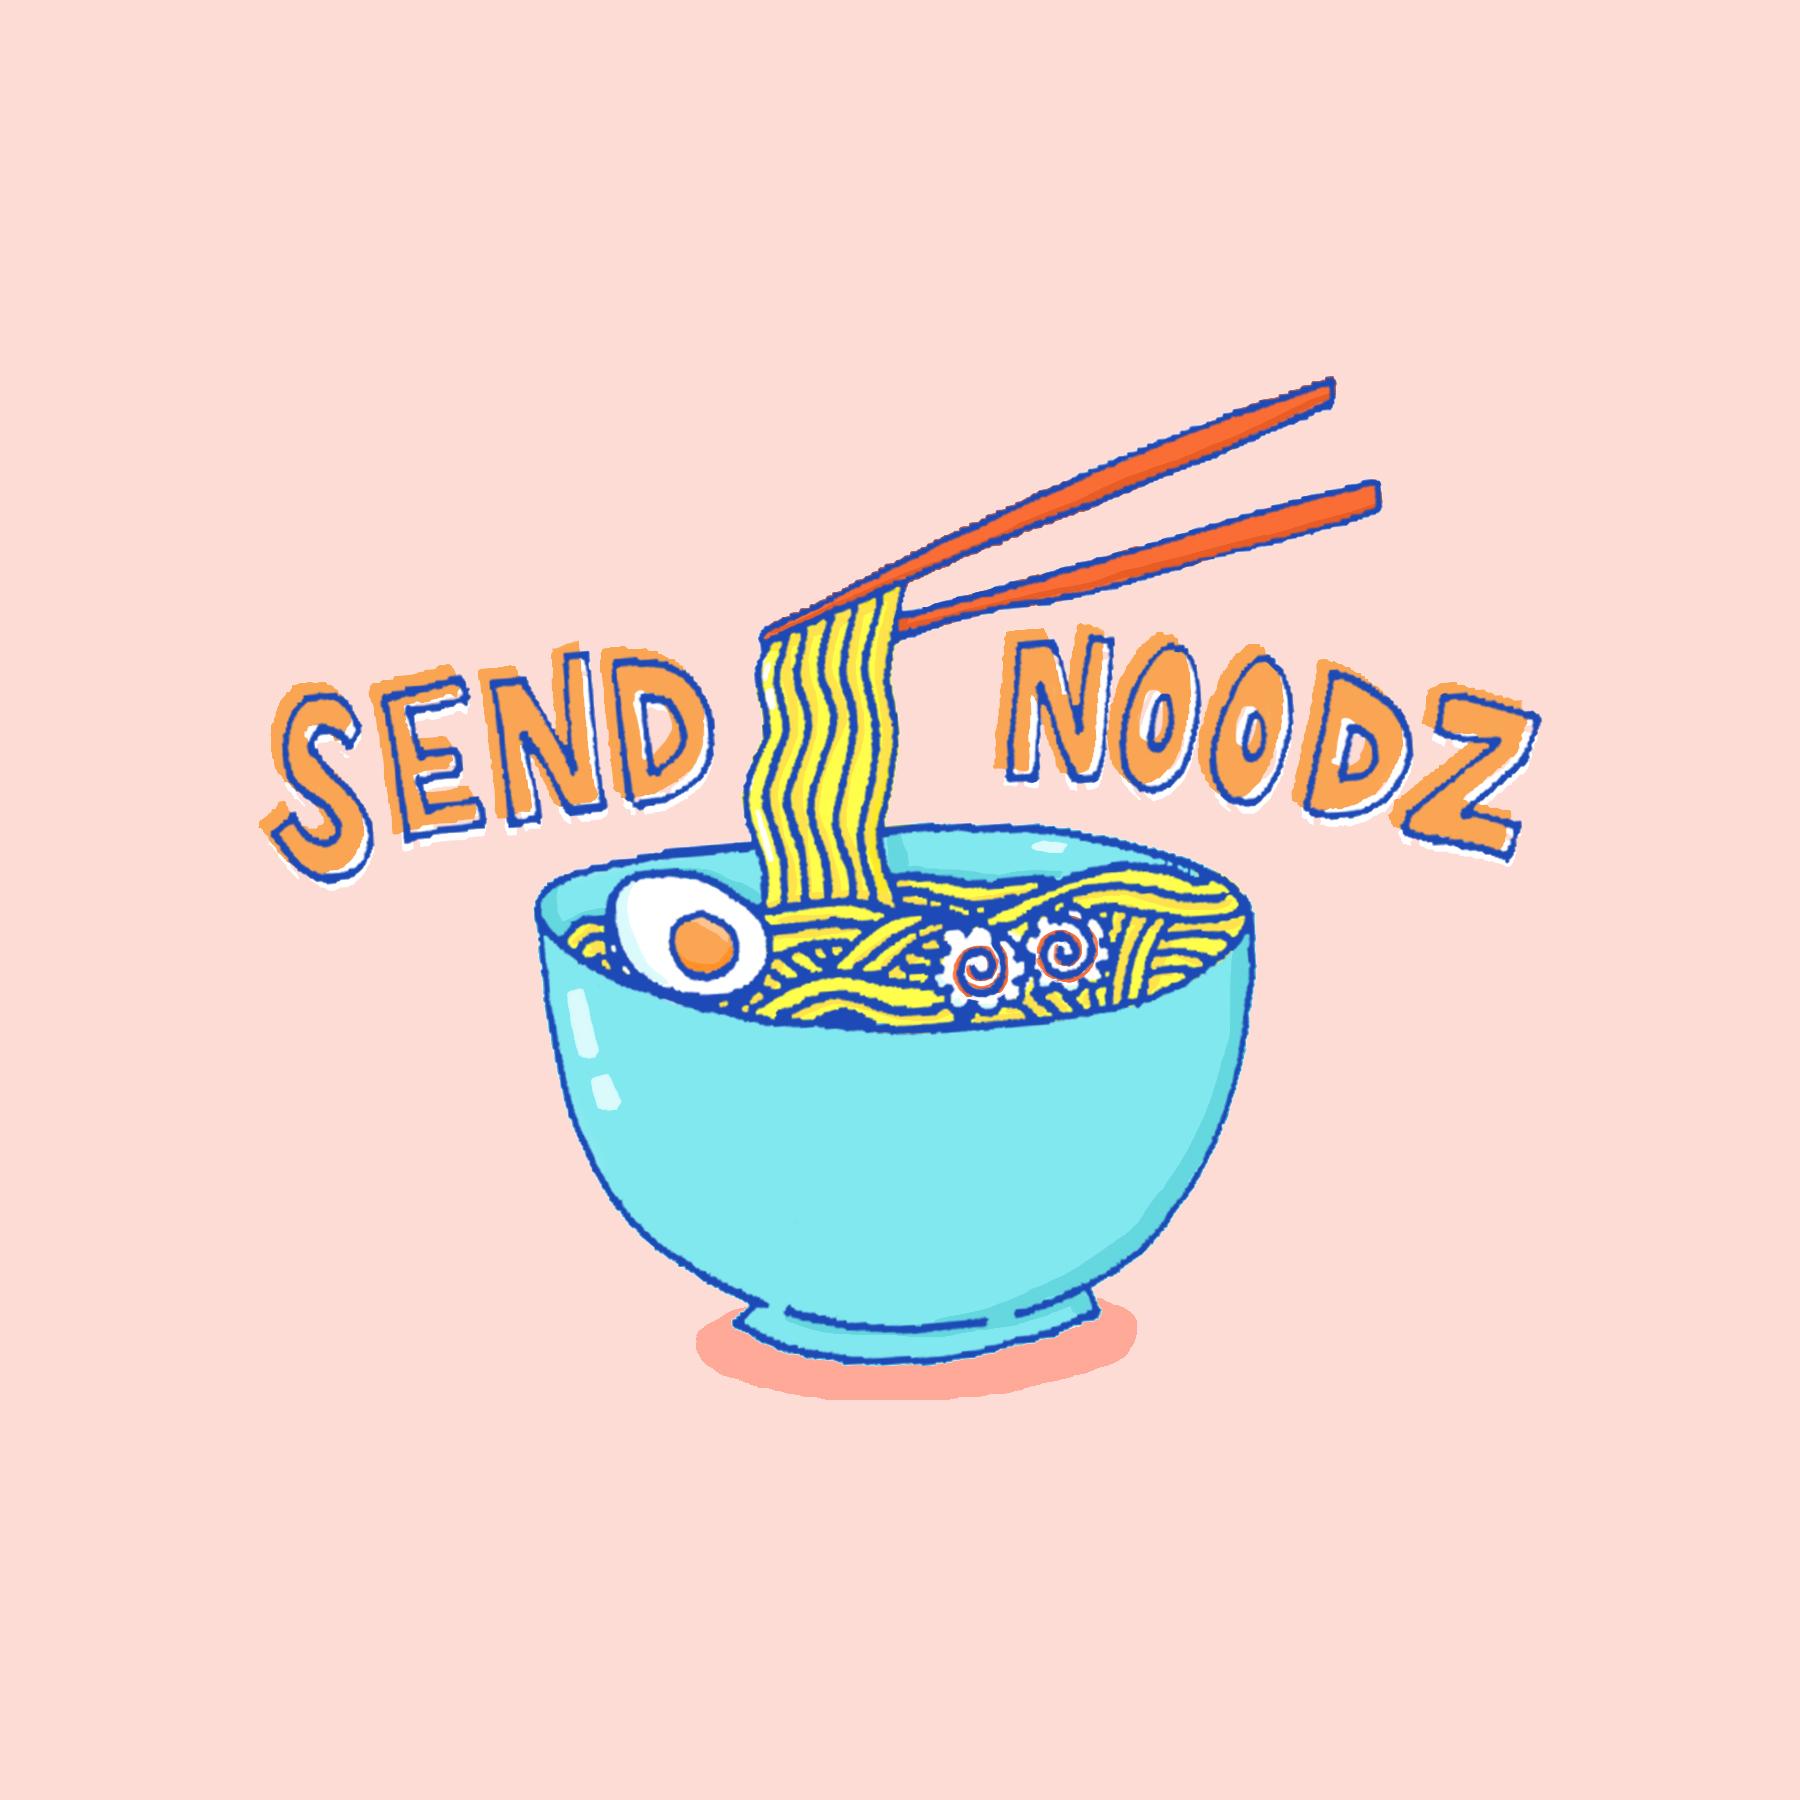 Send Noodz sticker for  Souped Up Slang Sticker Pack